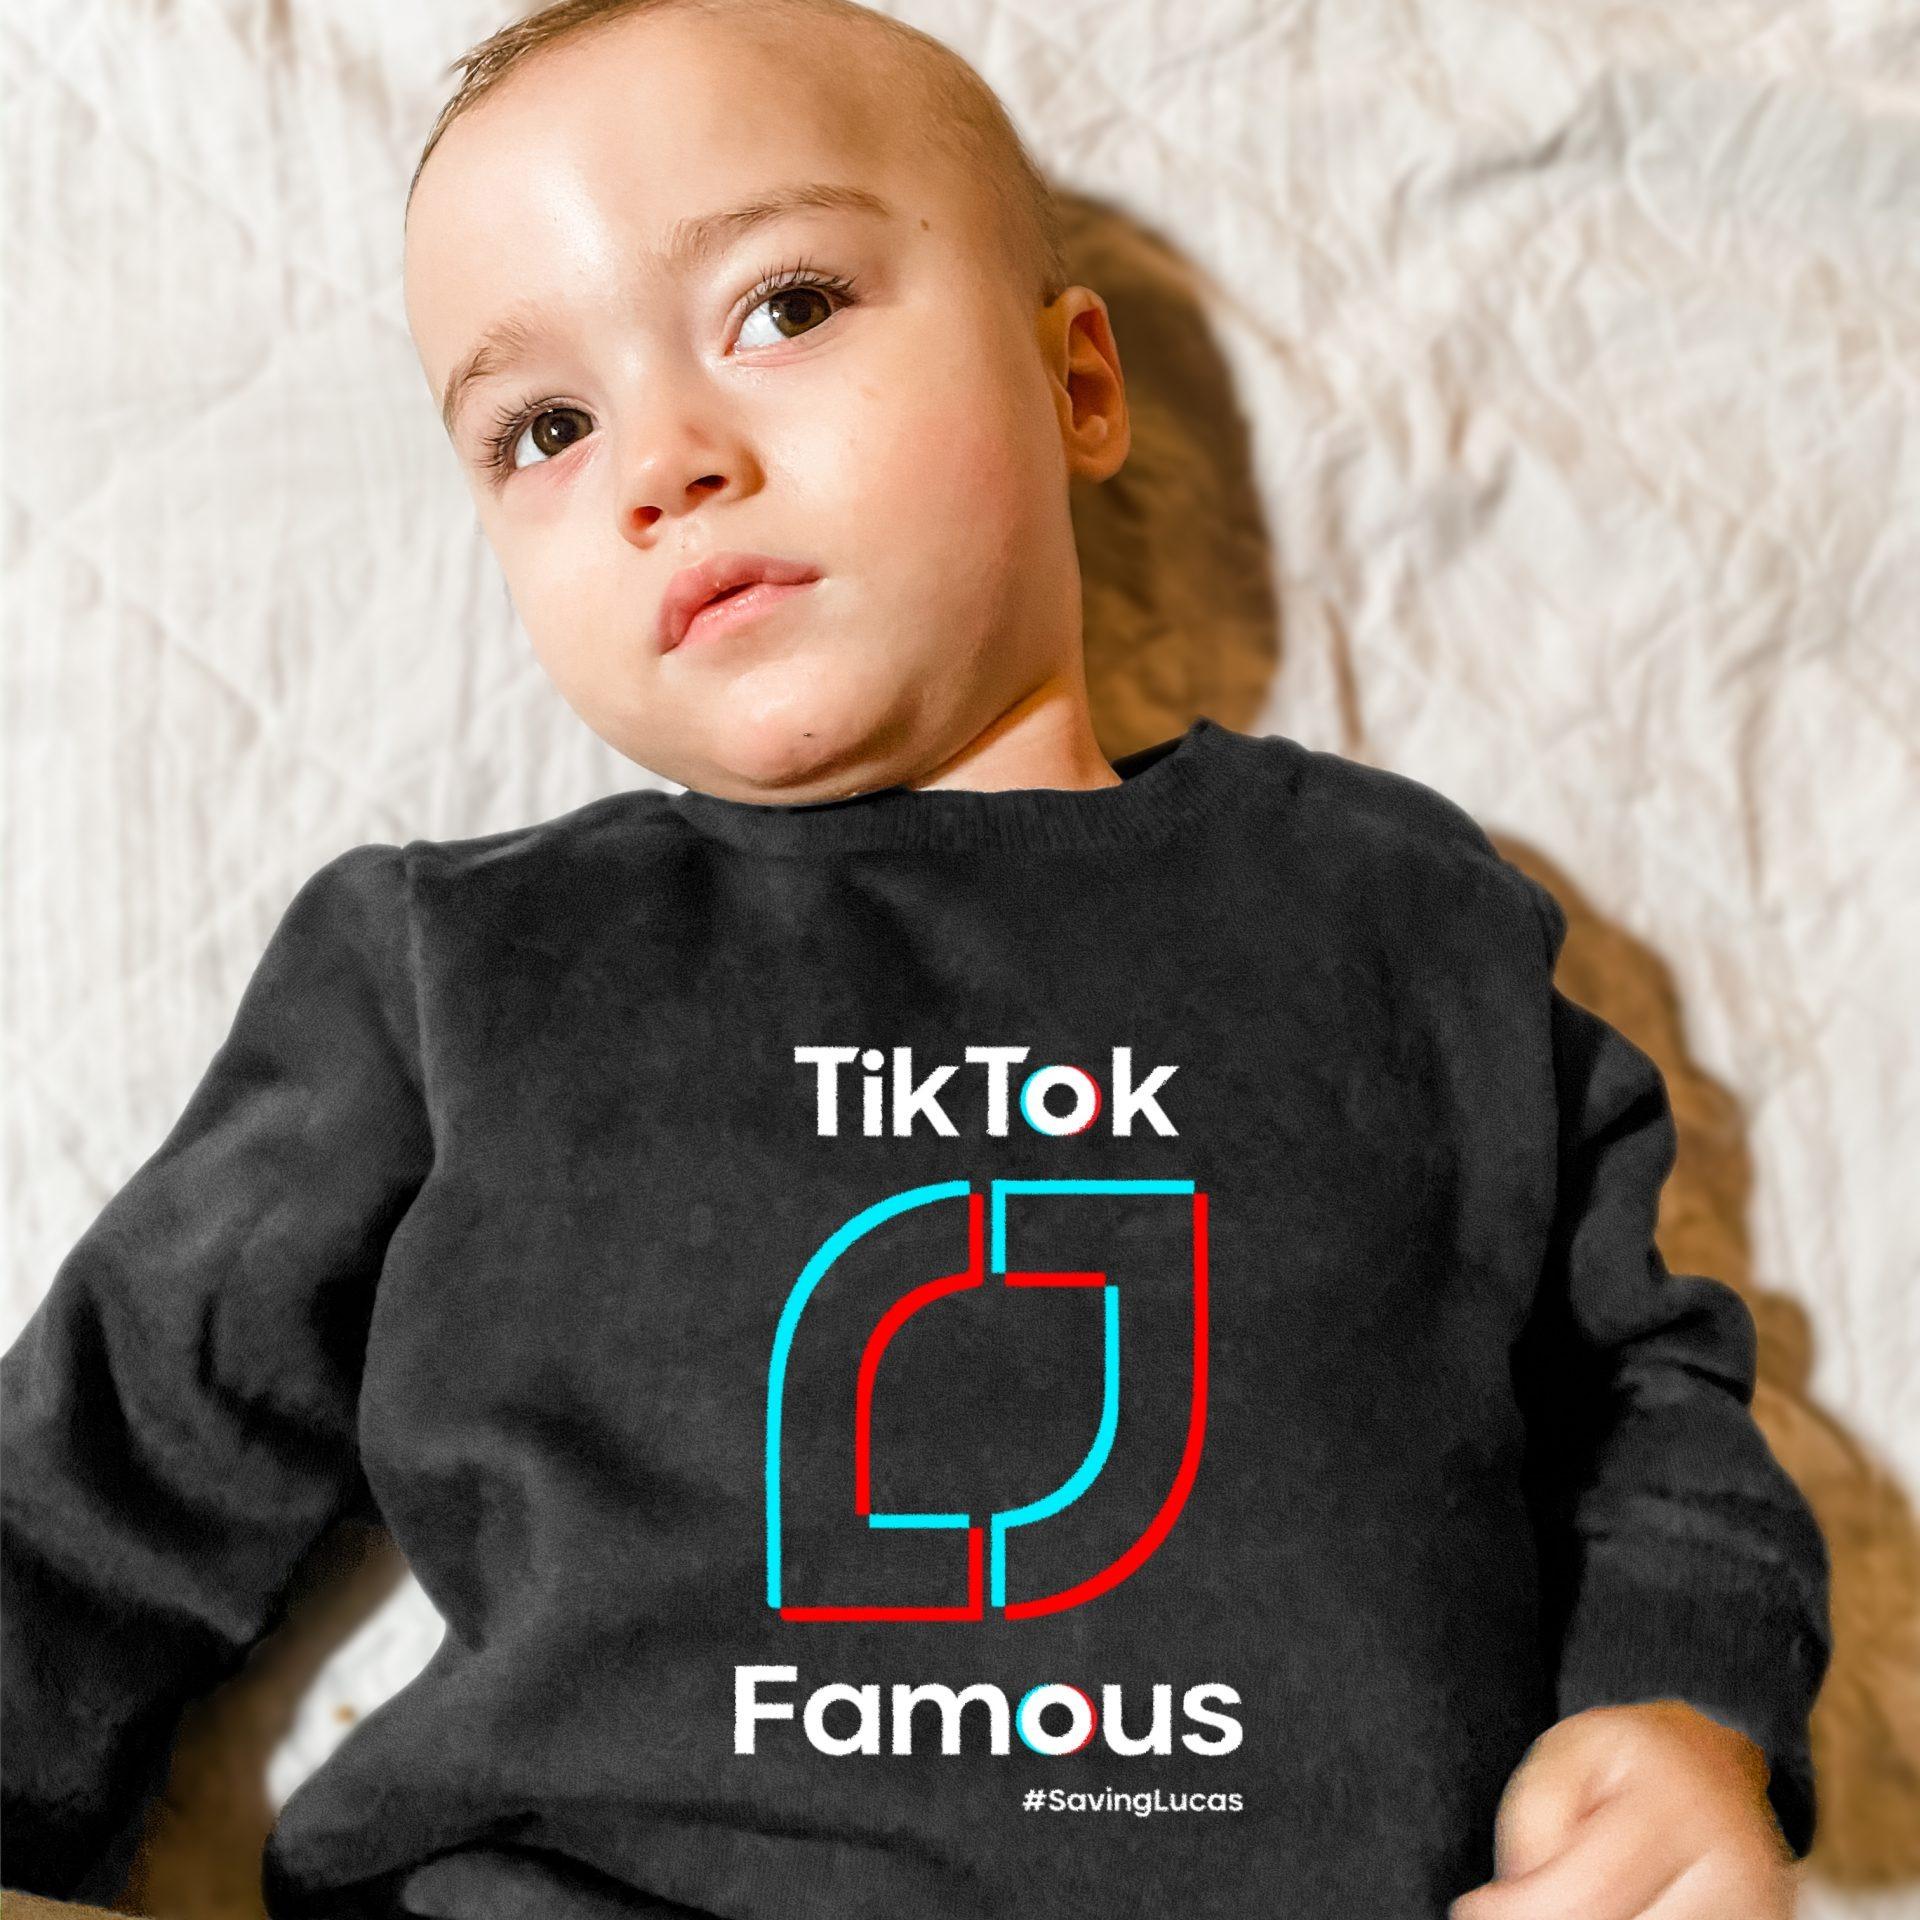 TikTok Famous Free T-shirt #SavingLucas